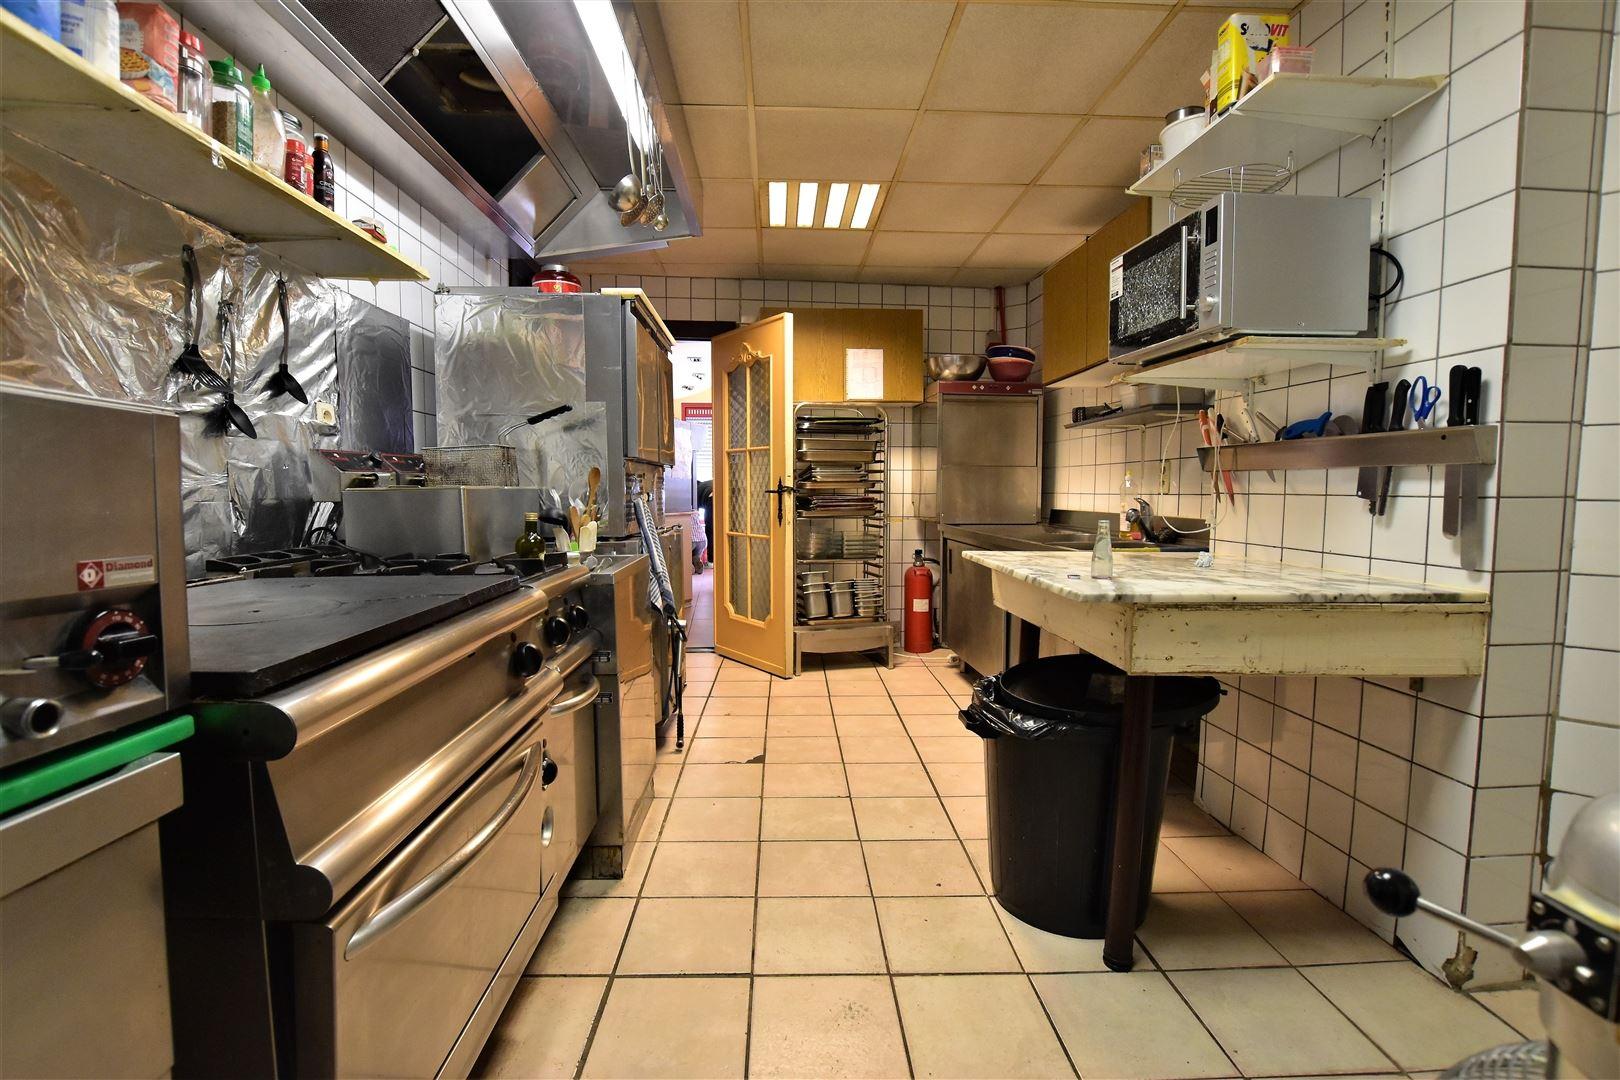 Foto 8 : Handelspand te 9200 Dendermonde (België) - Prijs € 1.250